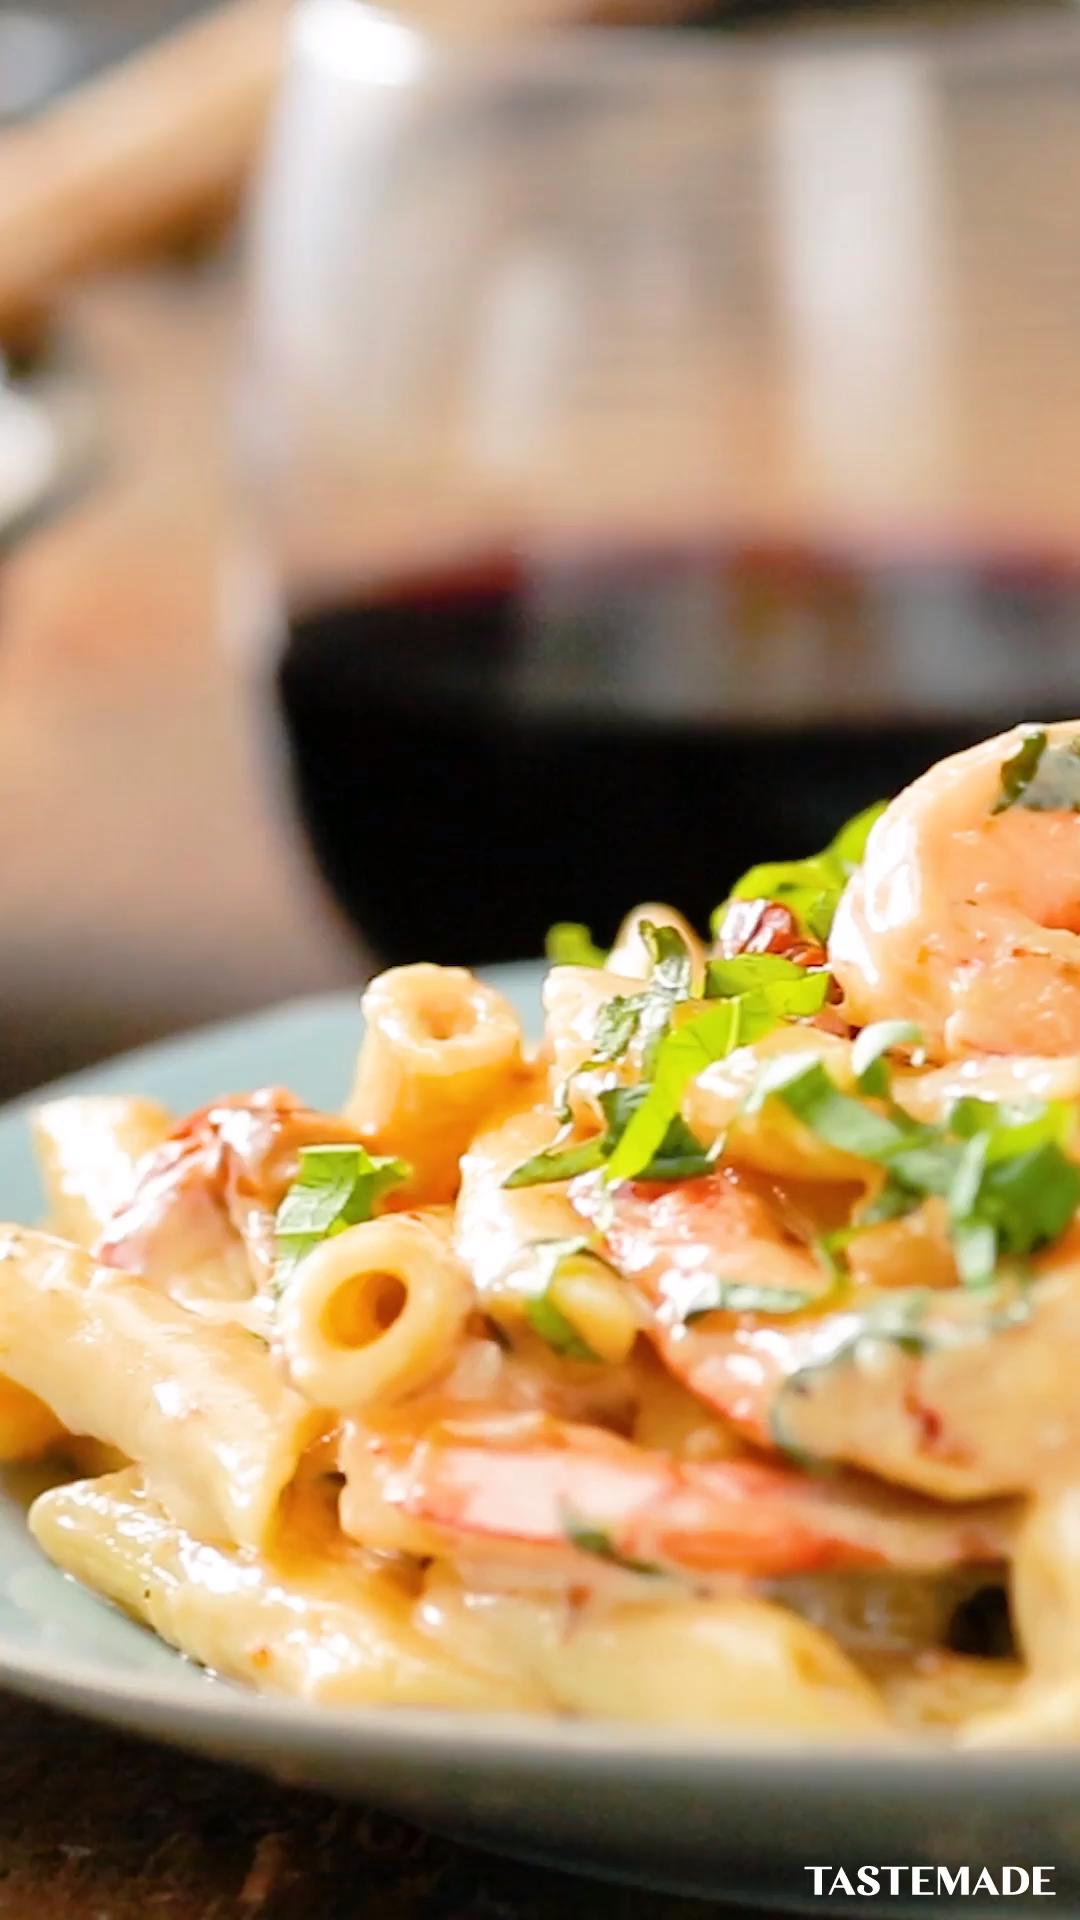 Creamy Shrimp & Mozzarella Pasta